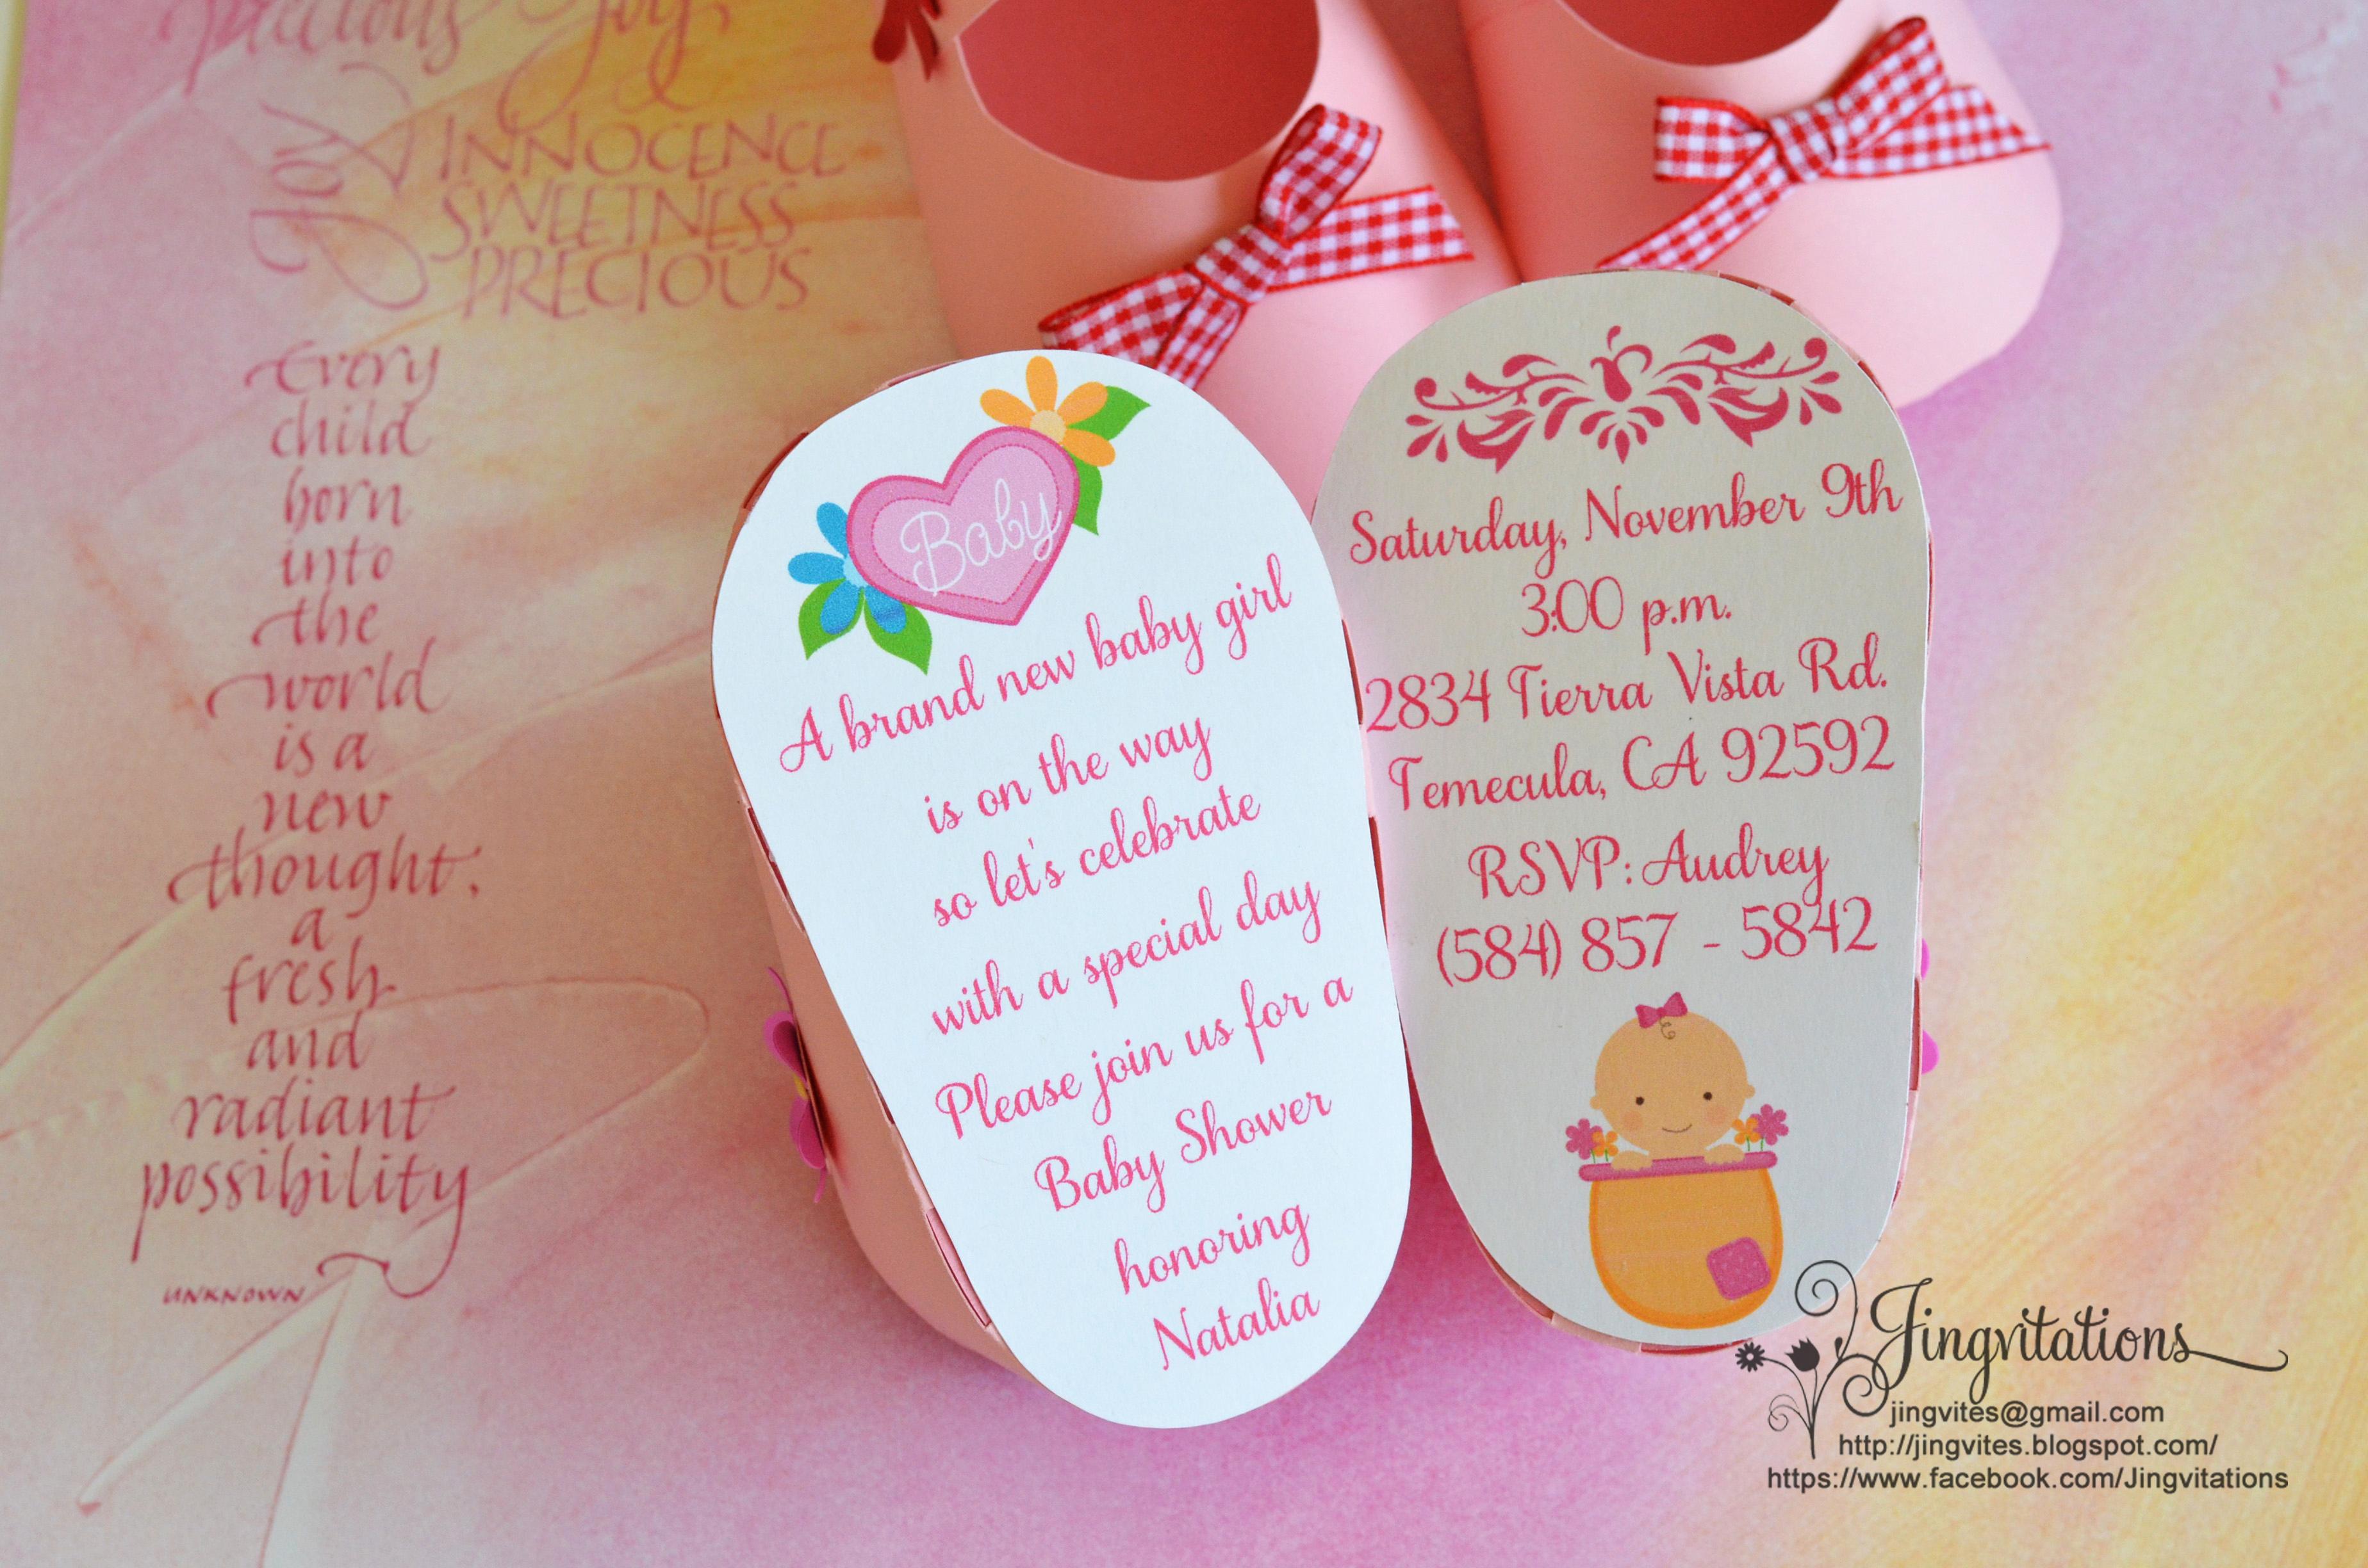 Creative Birthday Invitation Ideas Inspirational Party Favors